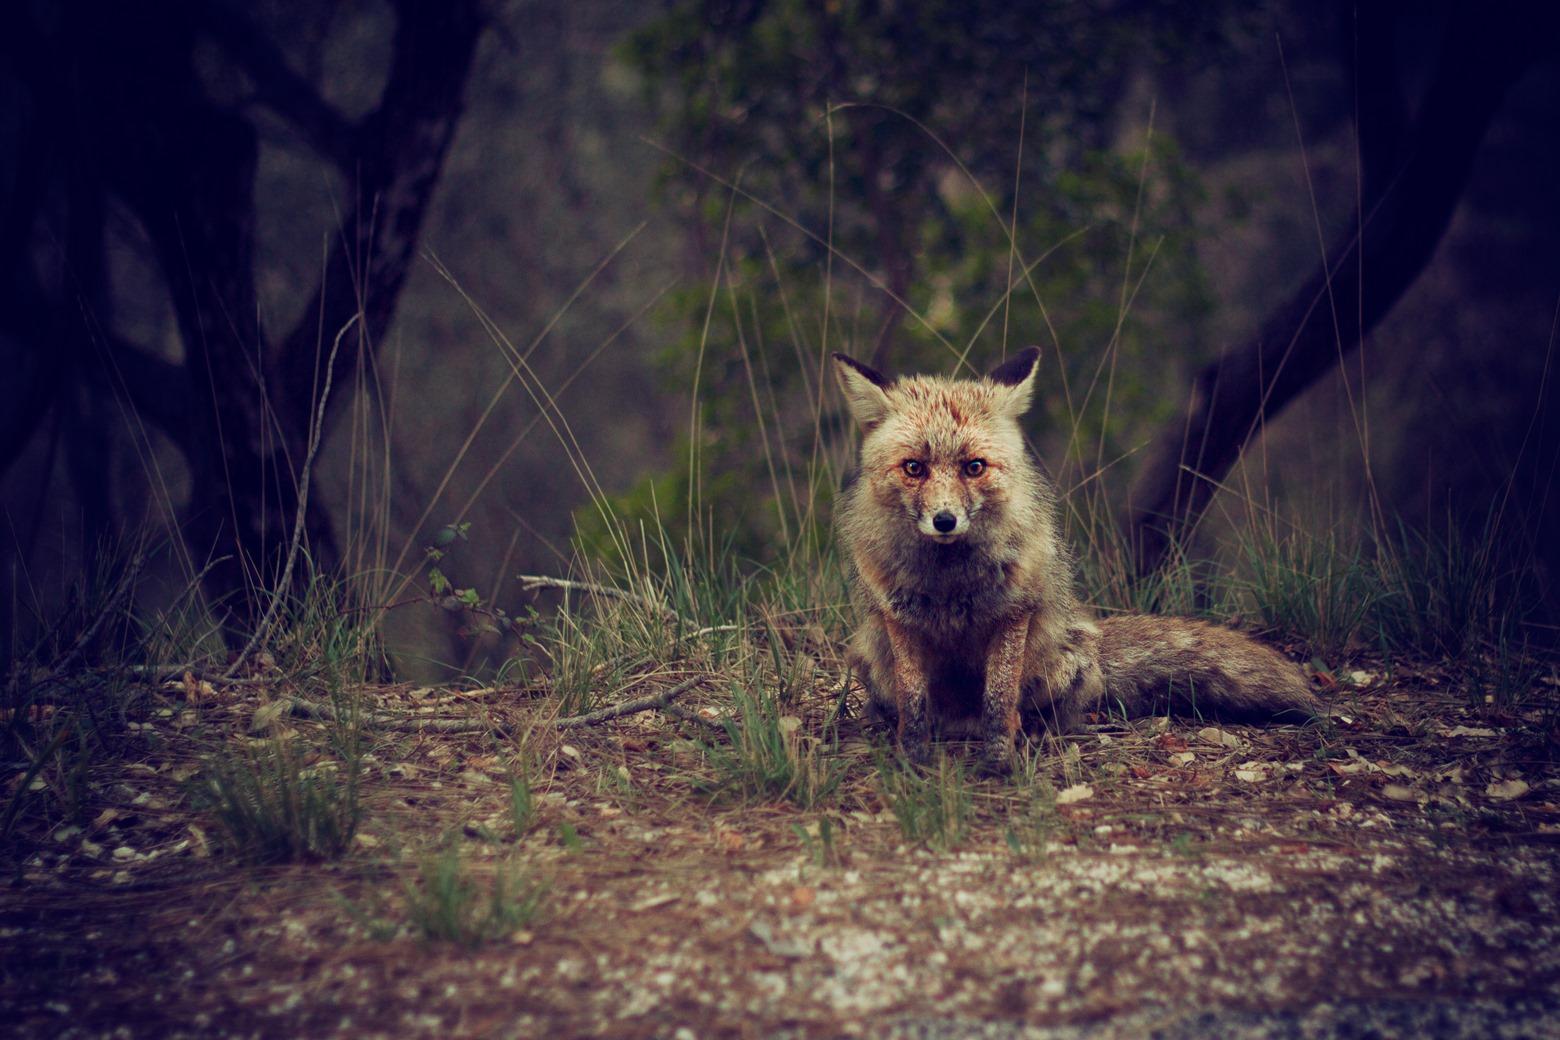 nqr33LlRR66jA3Ez9mX7_fox-in-the-forest-by-jose-inesta